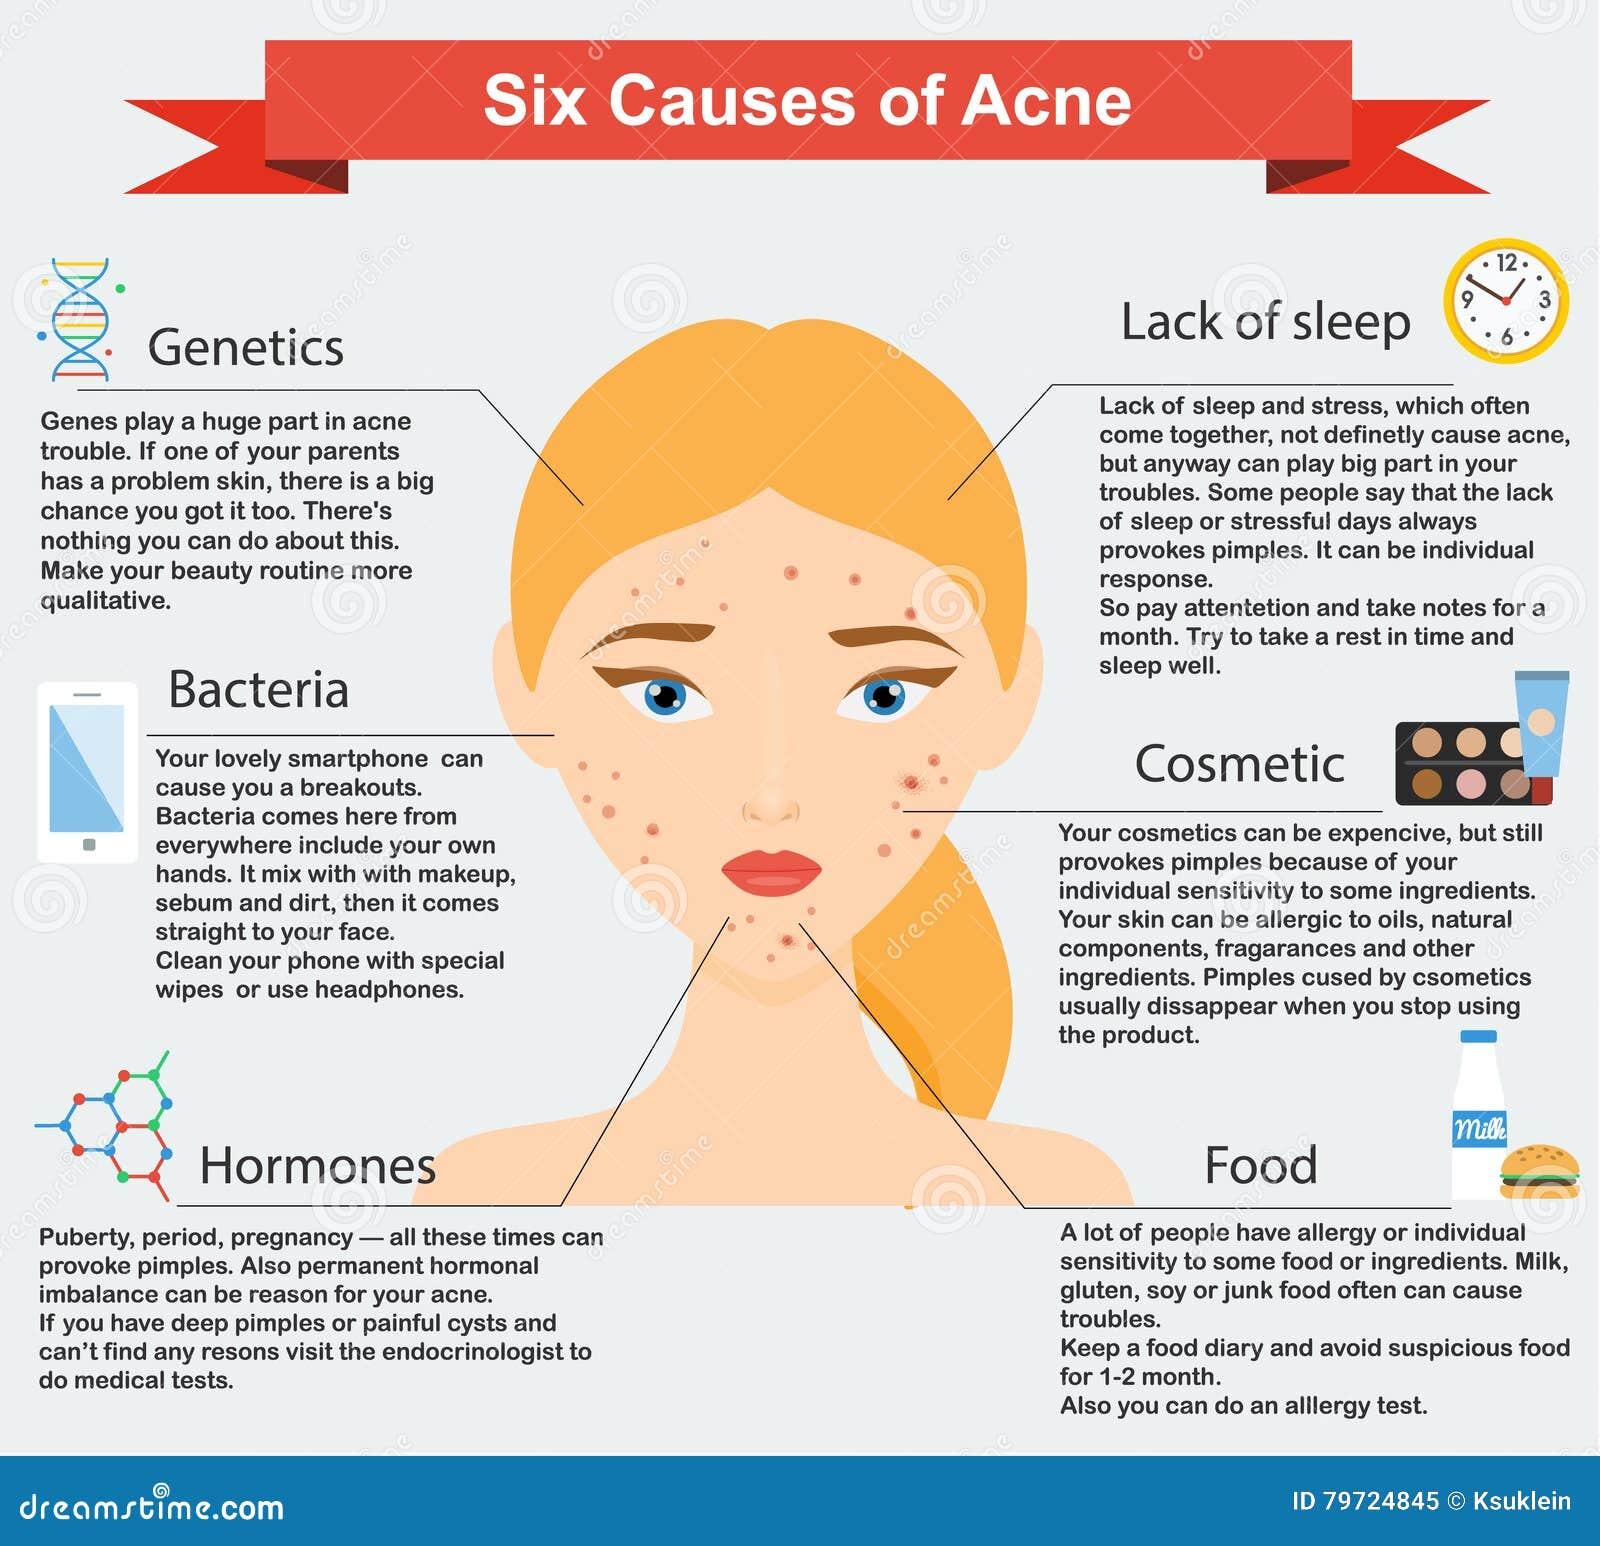 acne cartoons  illustrations   vector stock images 608 cosmetology clip art free cosmetology clip art scissors